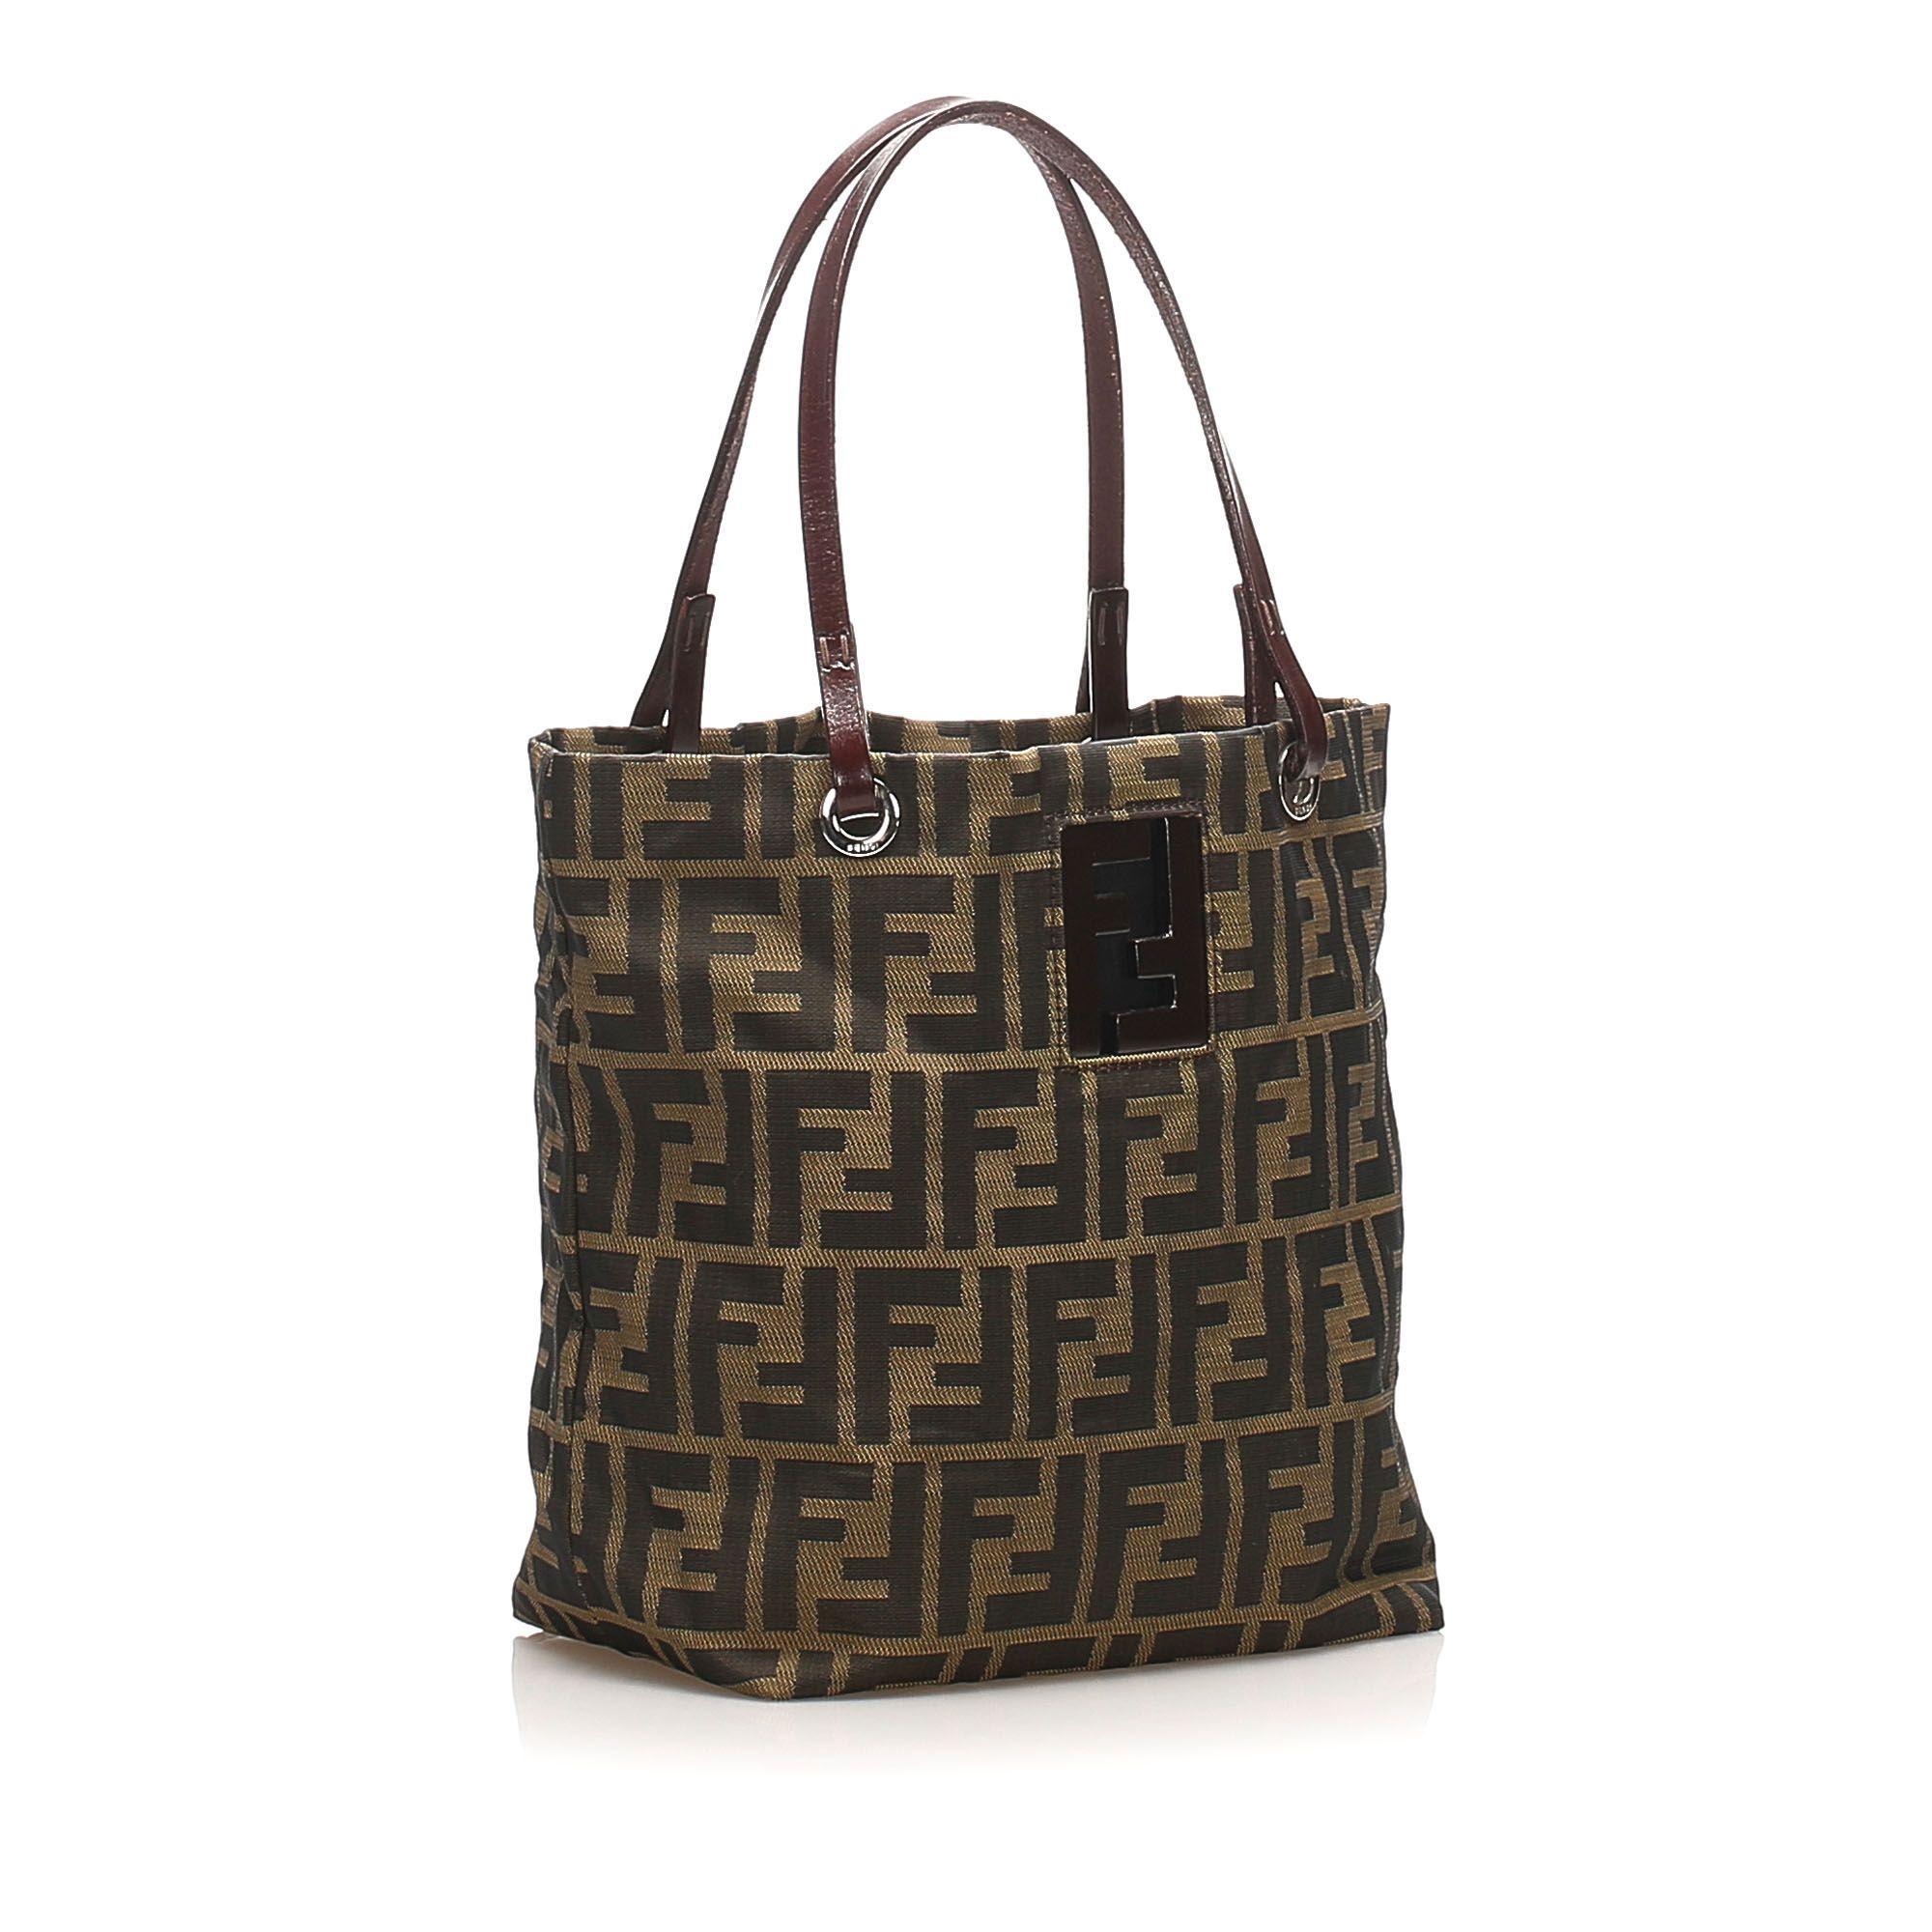 Vintage Fendi Zucca Canvas Handbag Brown